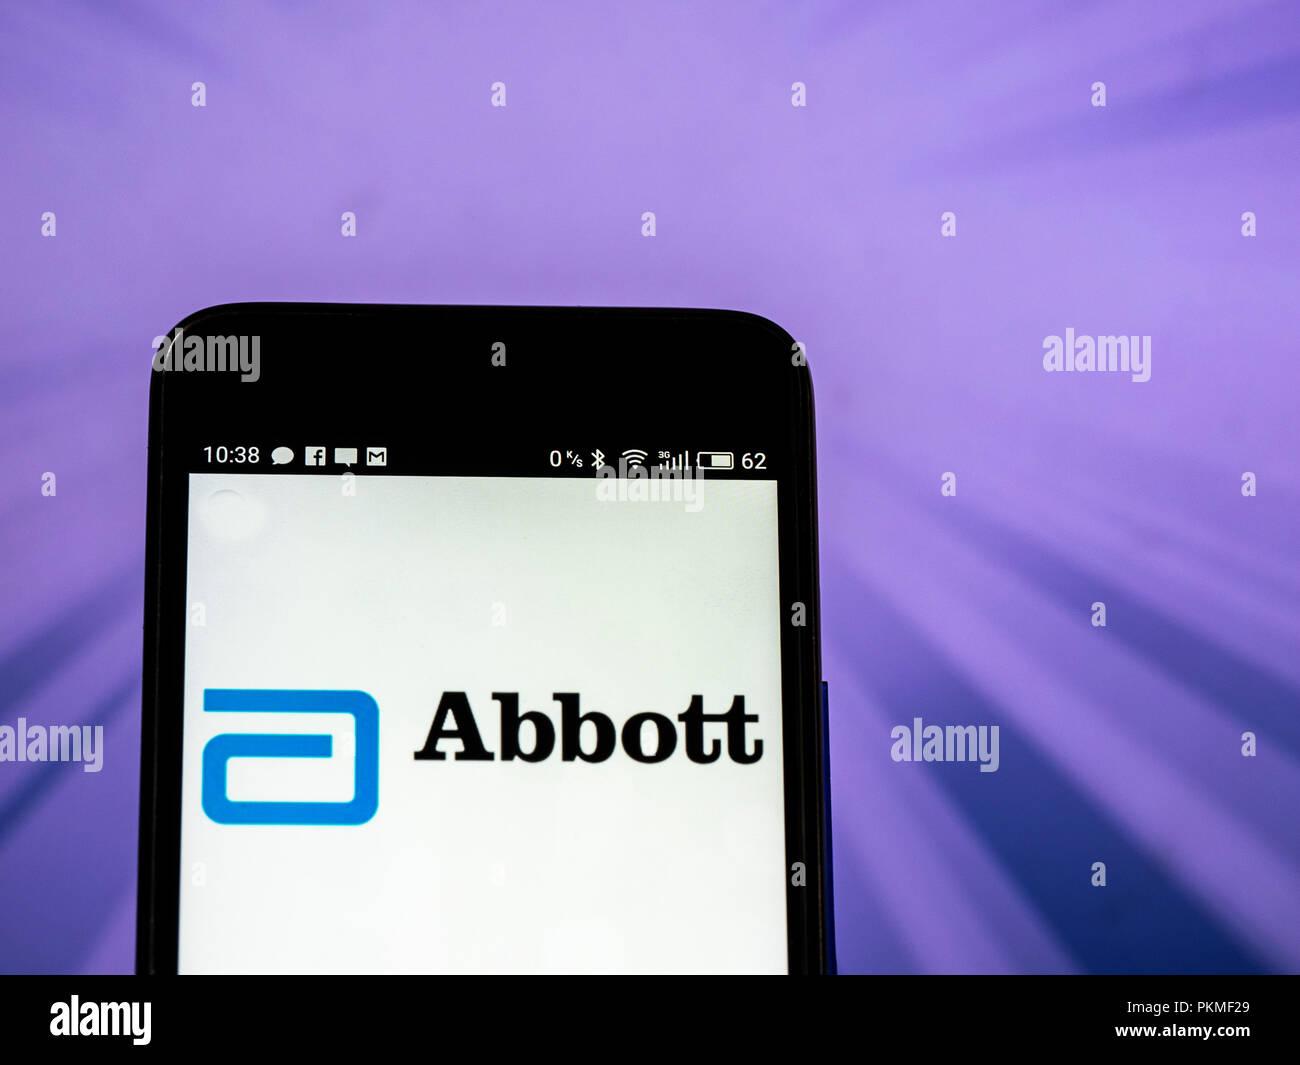 Abbott Laboratories Stock Photos Abbott Laboratories Stock Images